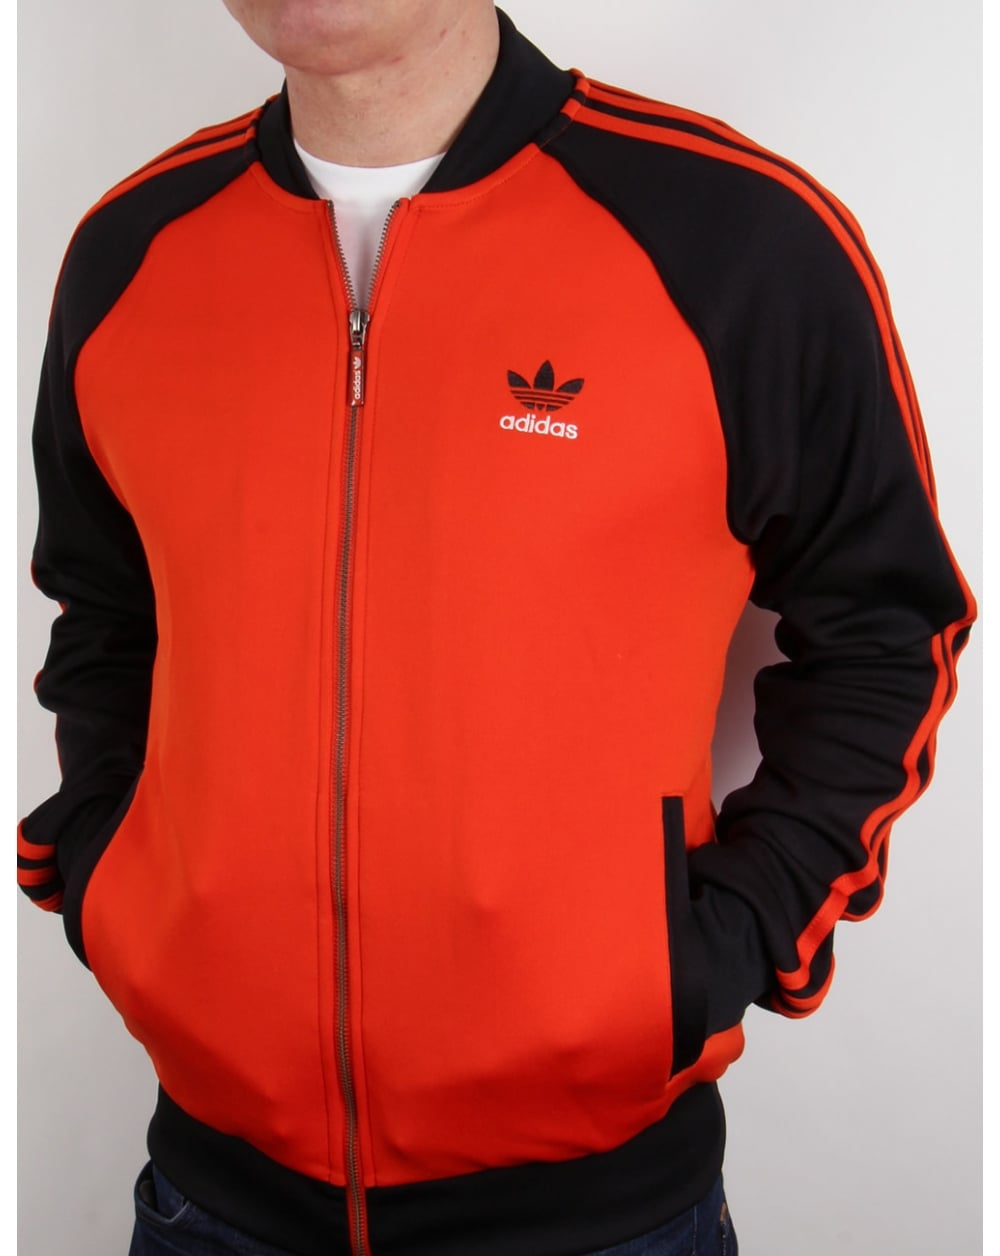 Adidas Originals Superstar Track Top Orange Black Jacket